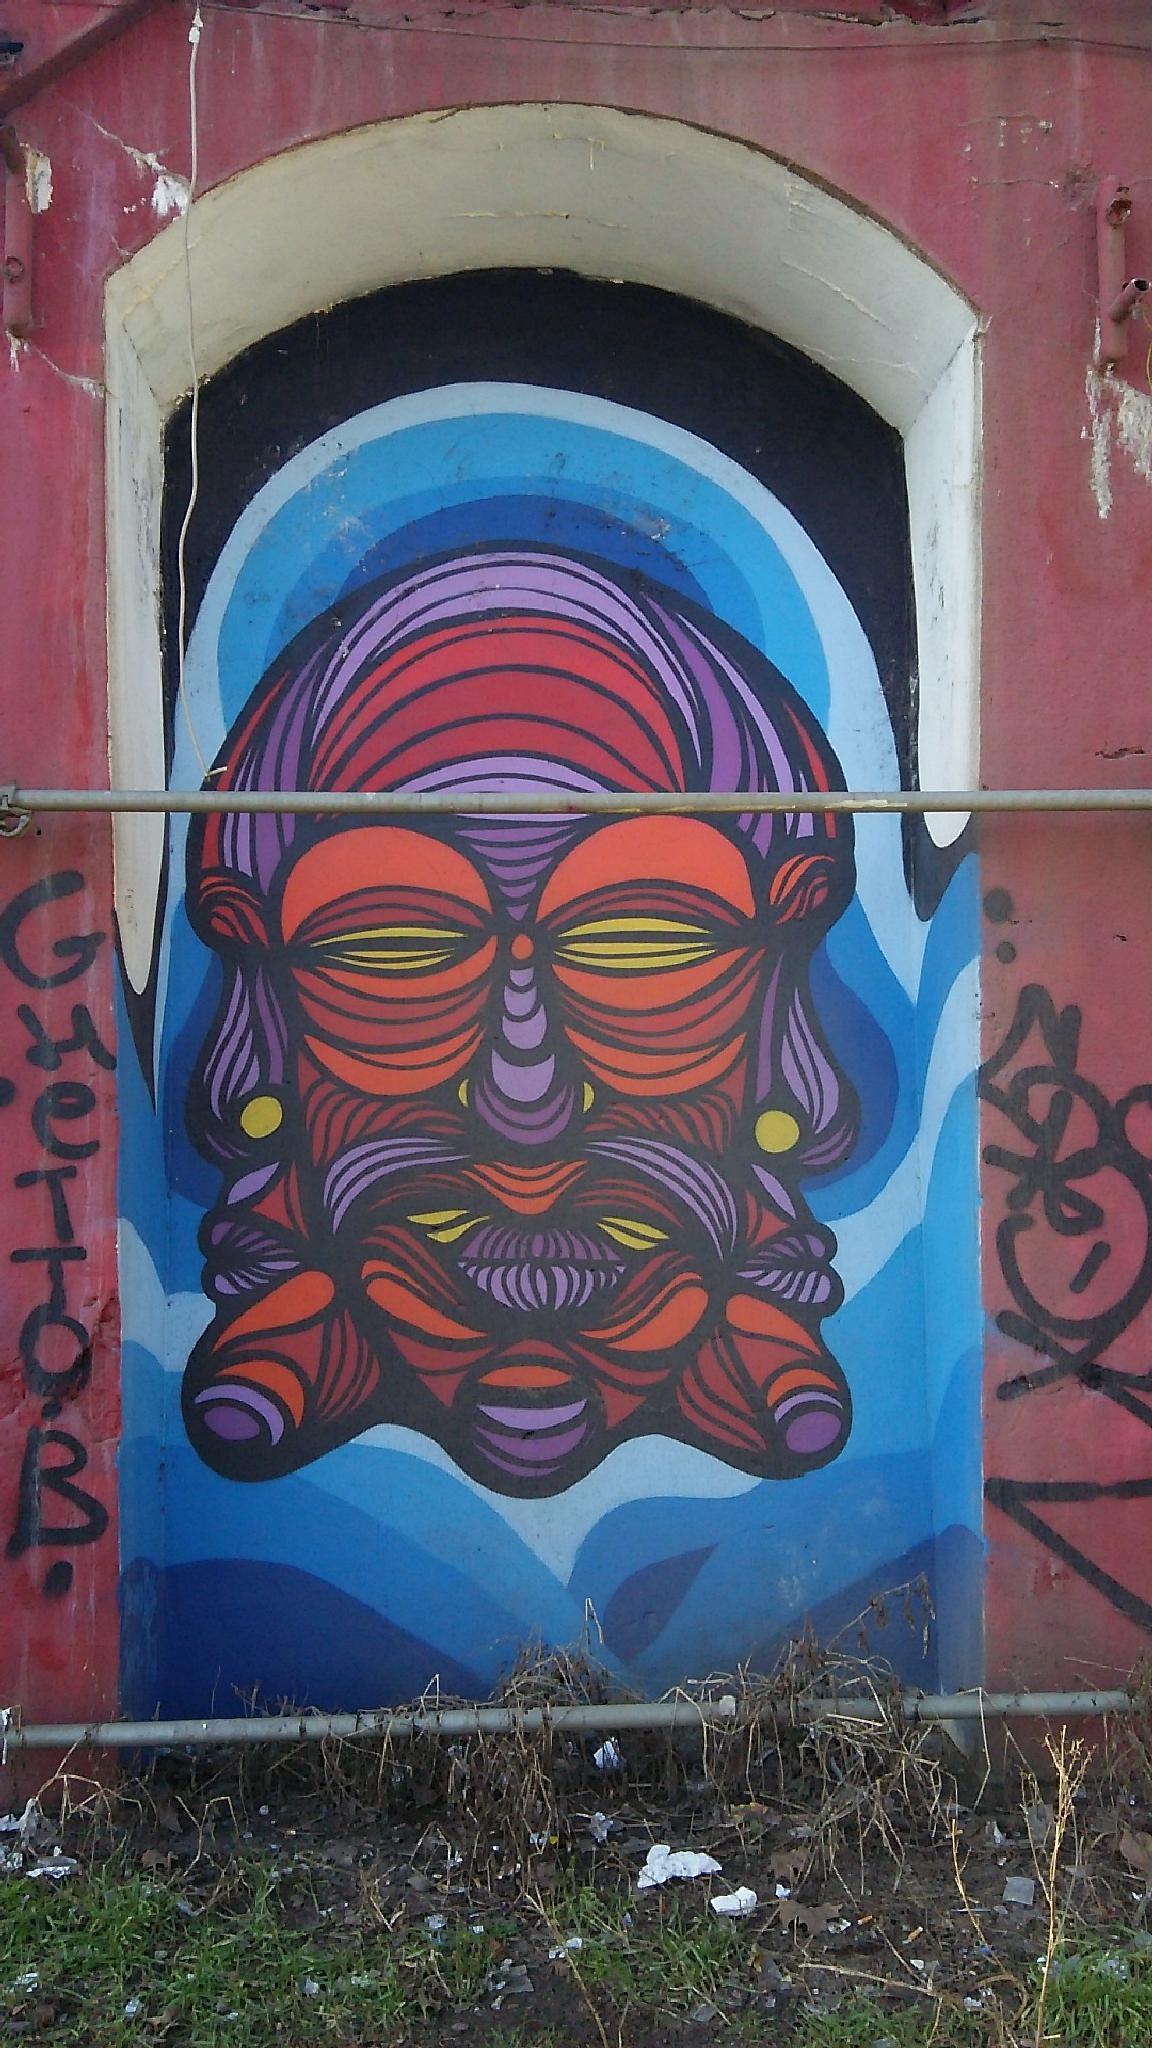 Graffiti Art by Graffiti